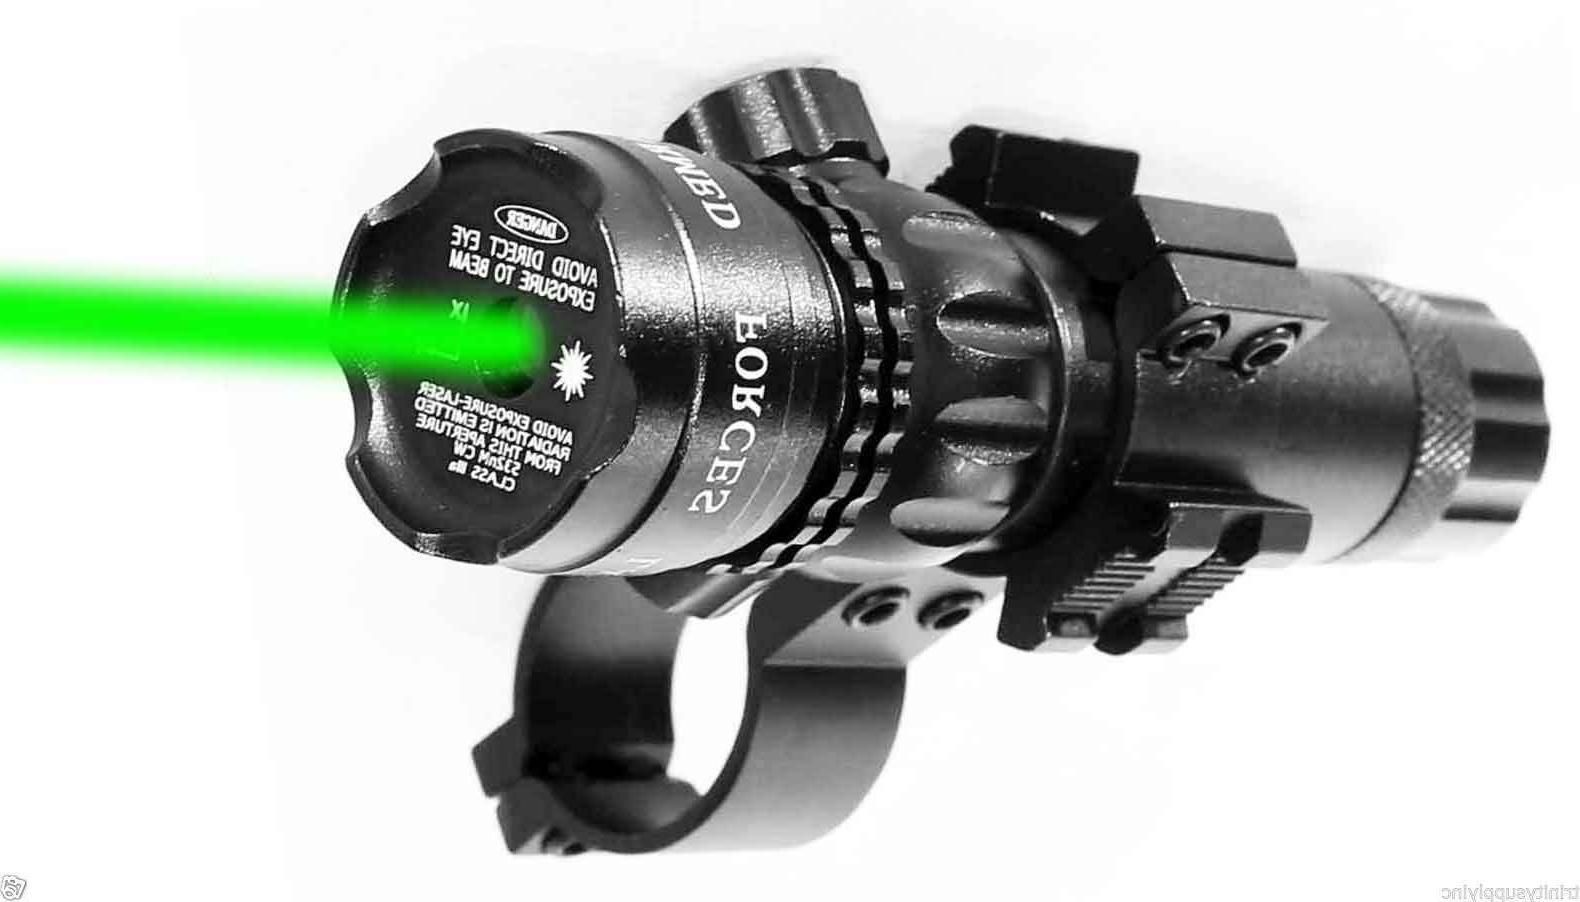 Remington 12 Shotgun Green tactical hunting gear